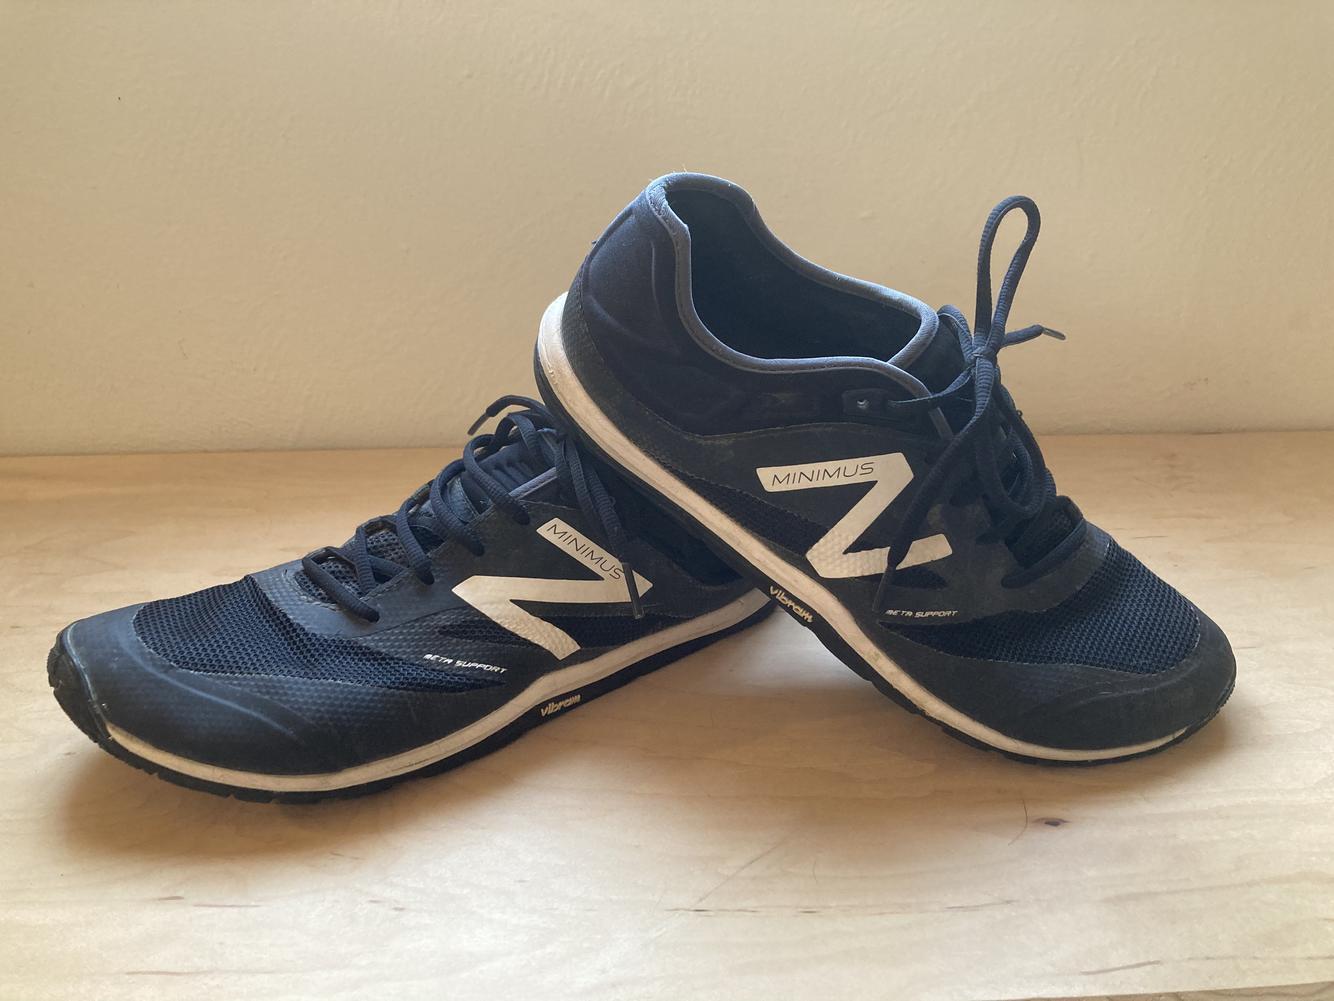 New Balance Minimus Shoes Black Barely Used - Men's Size 12 ...